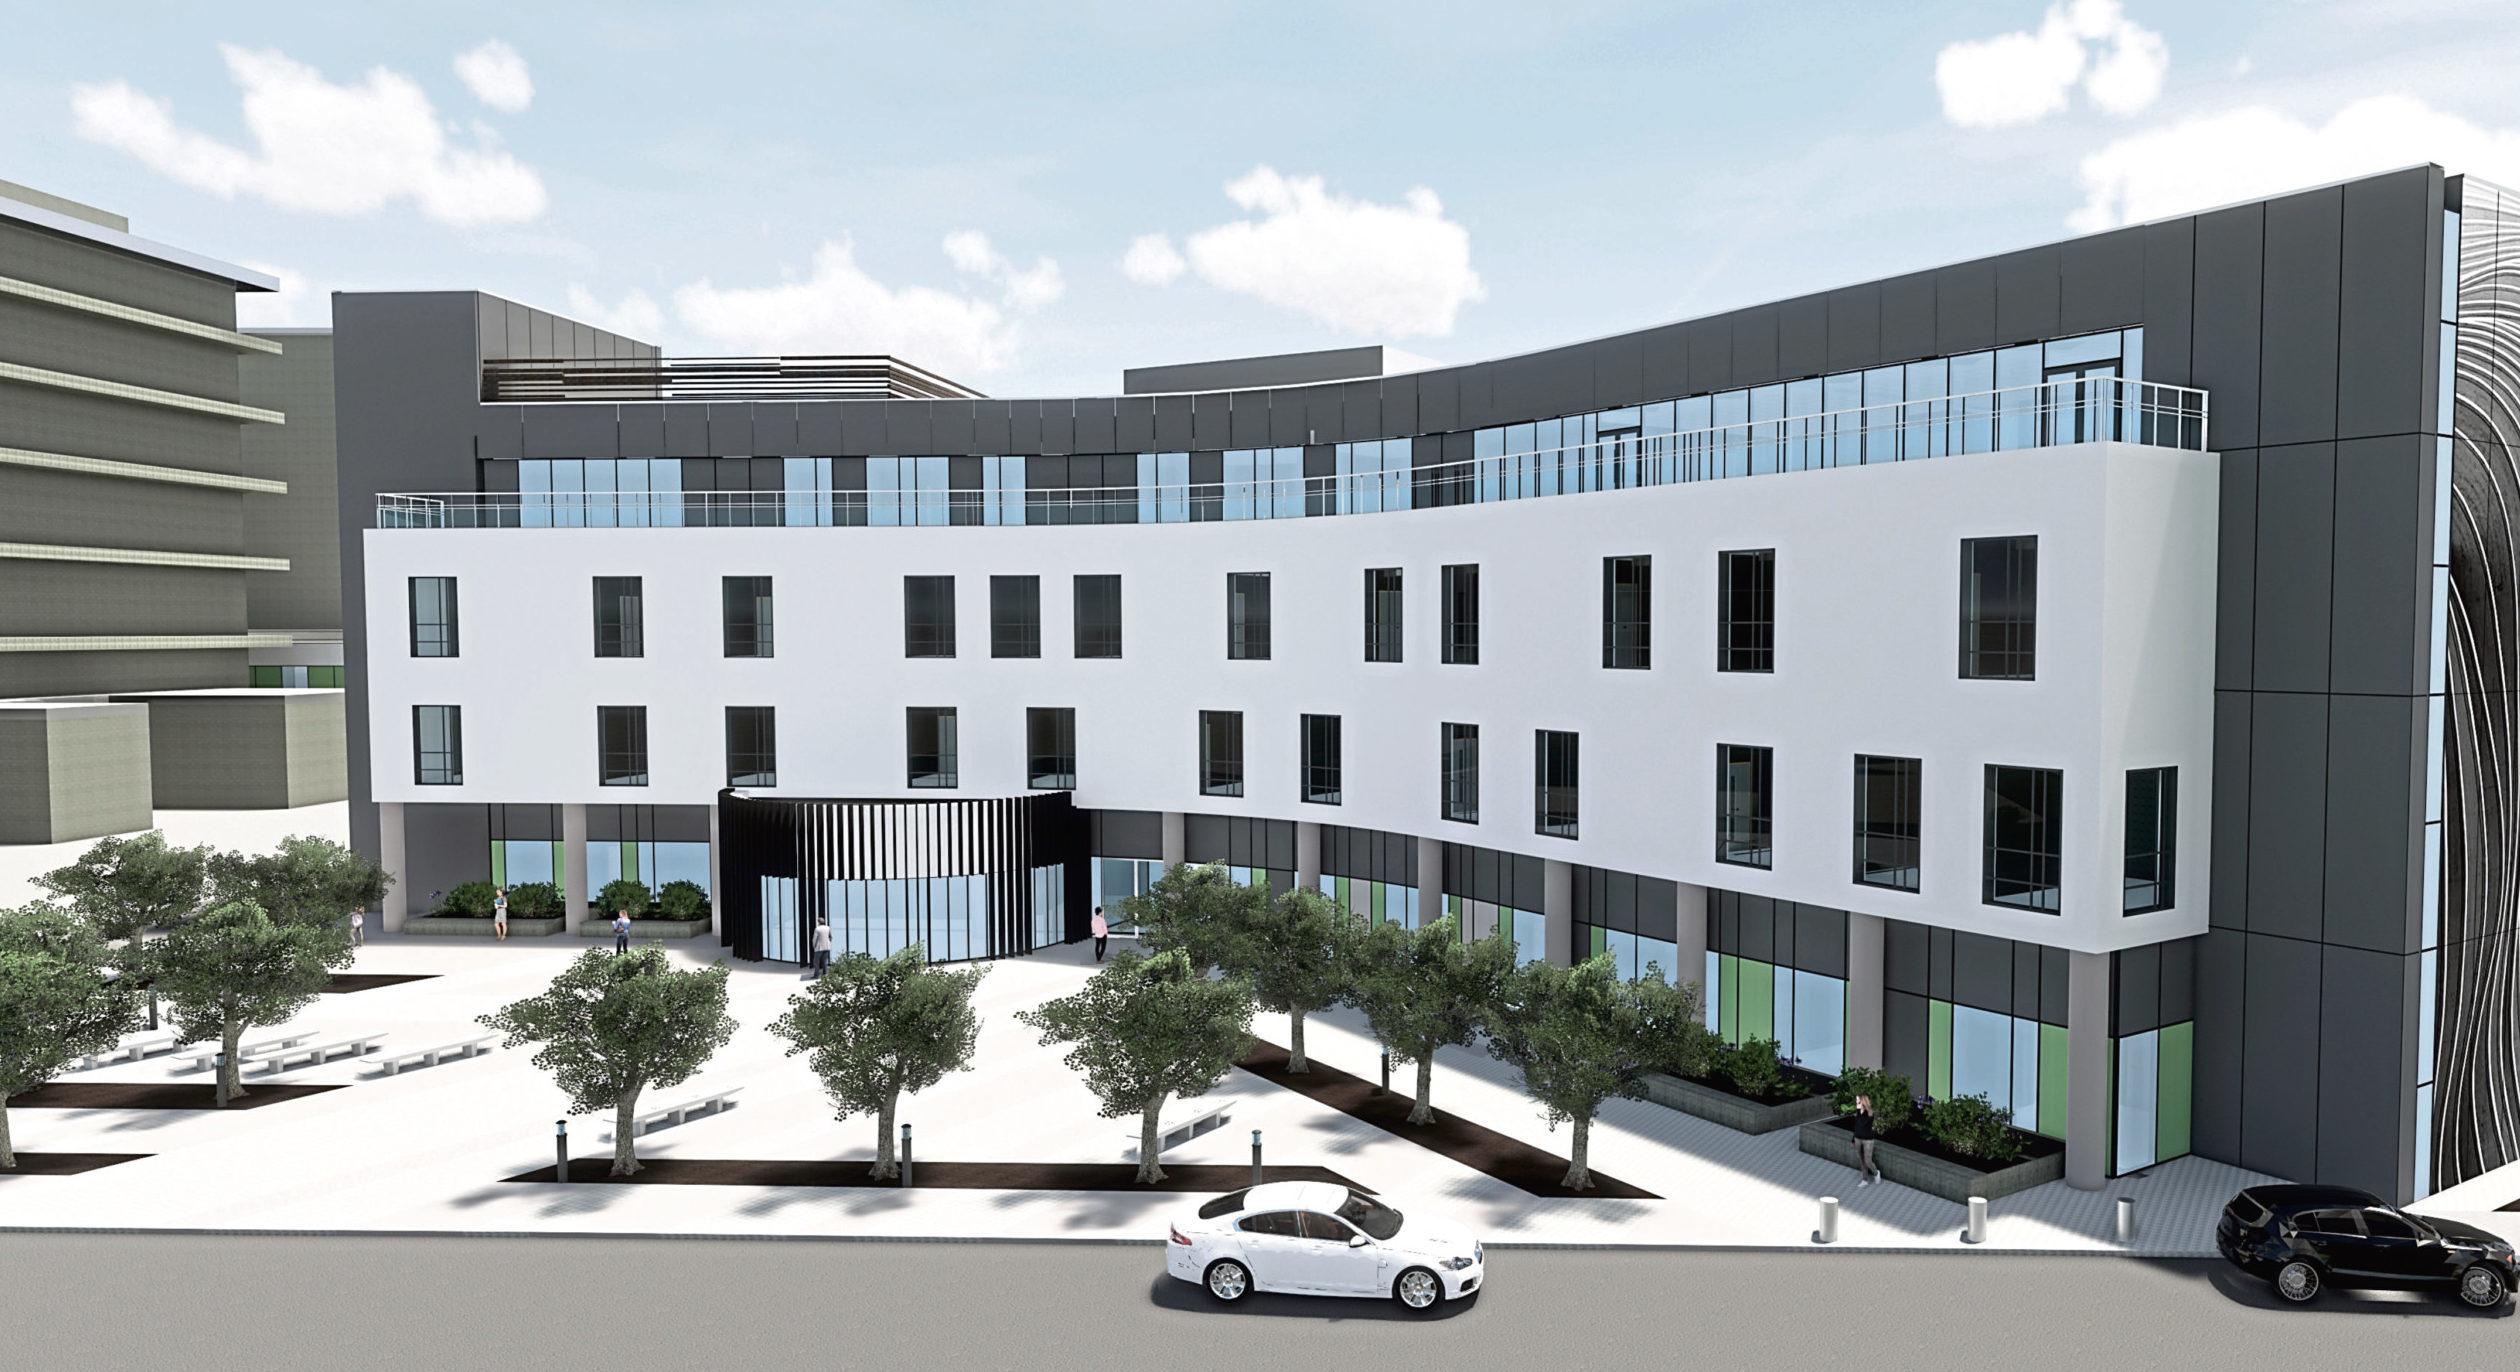 An artist's impression of the new £163 million Baird Family Hospital